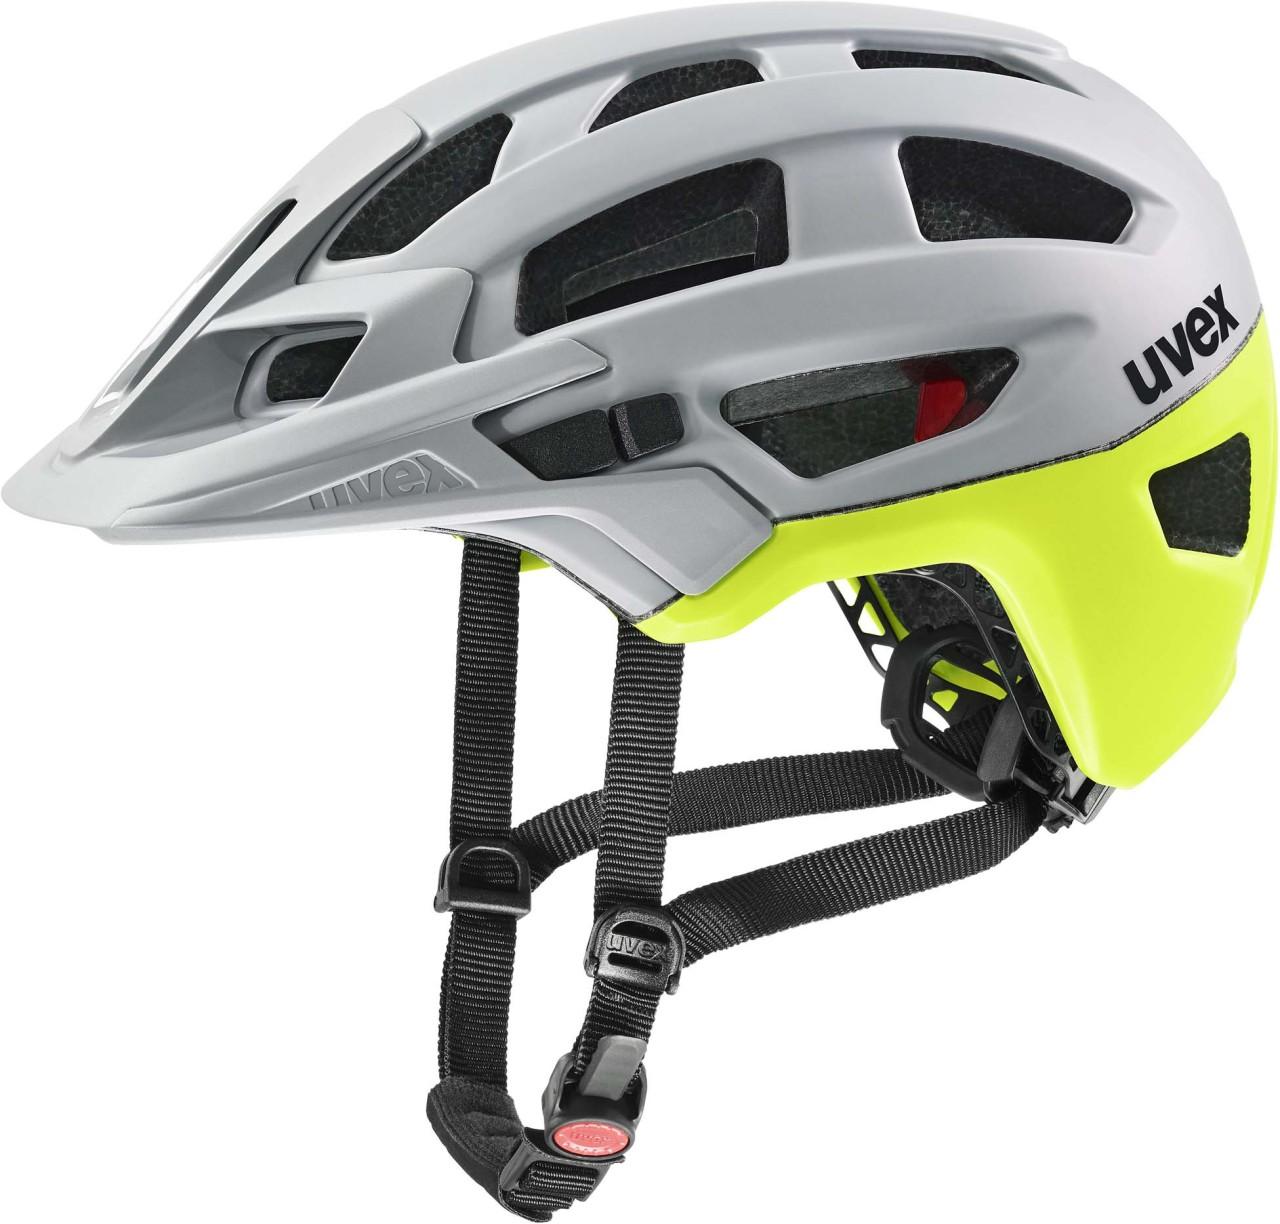 Uvex finale 2.0 - Fahrradhelm